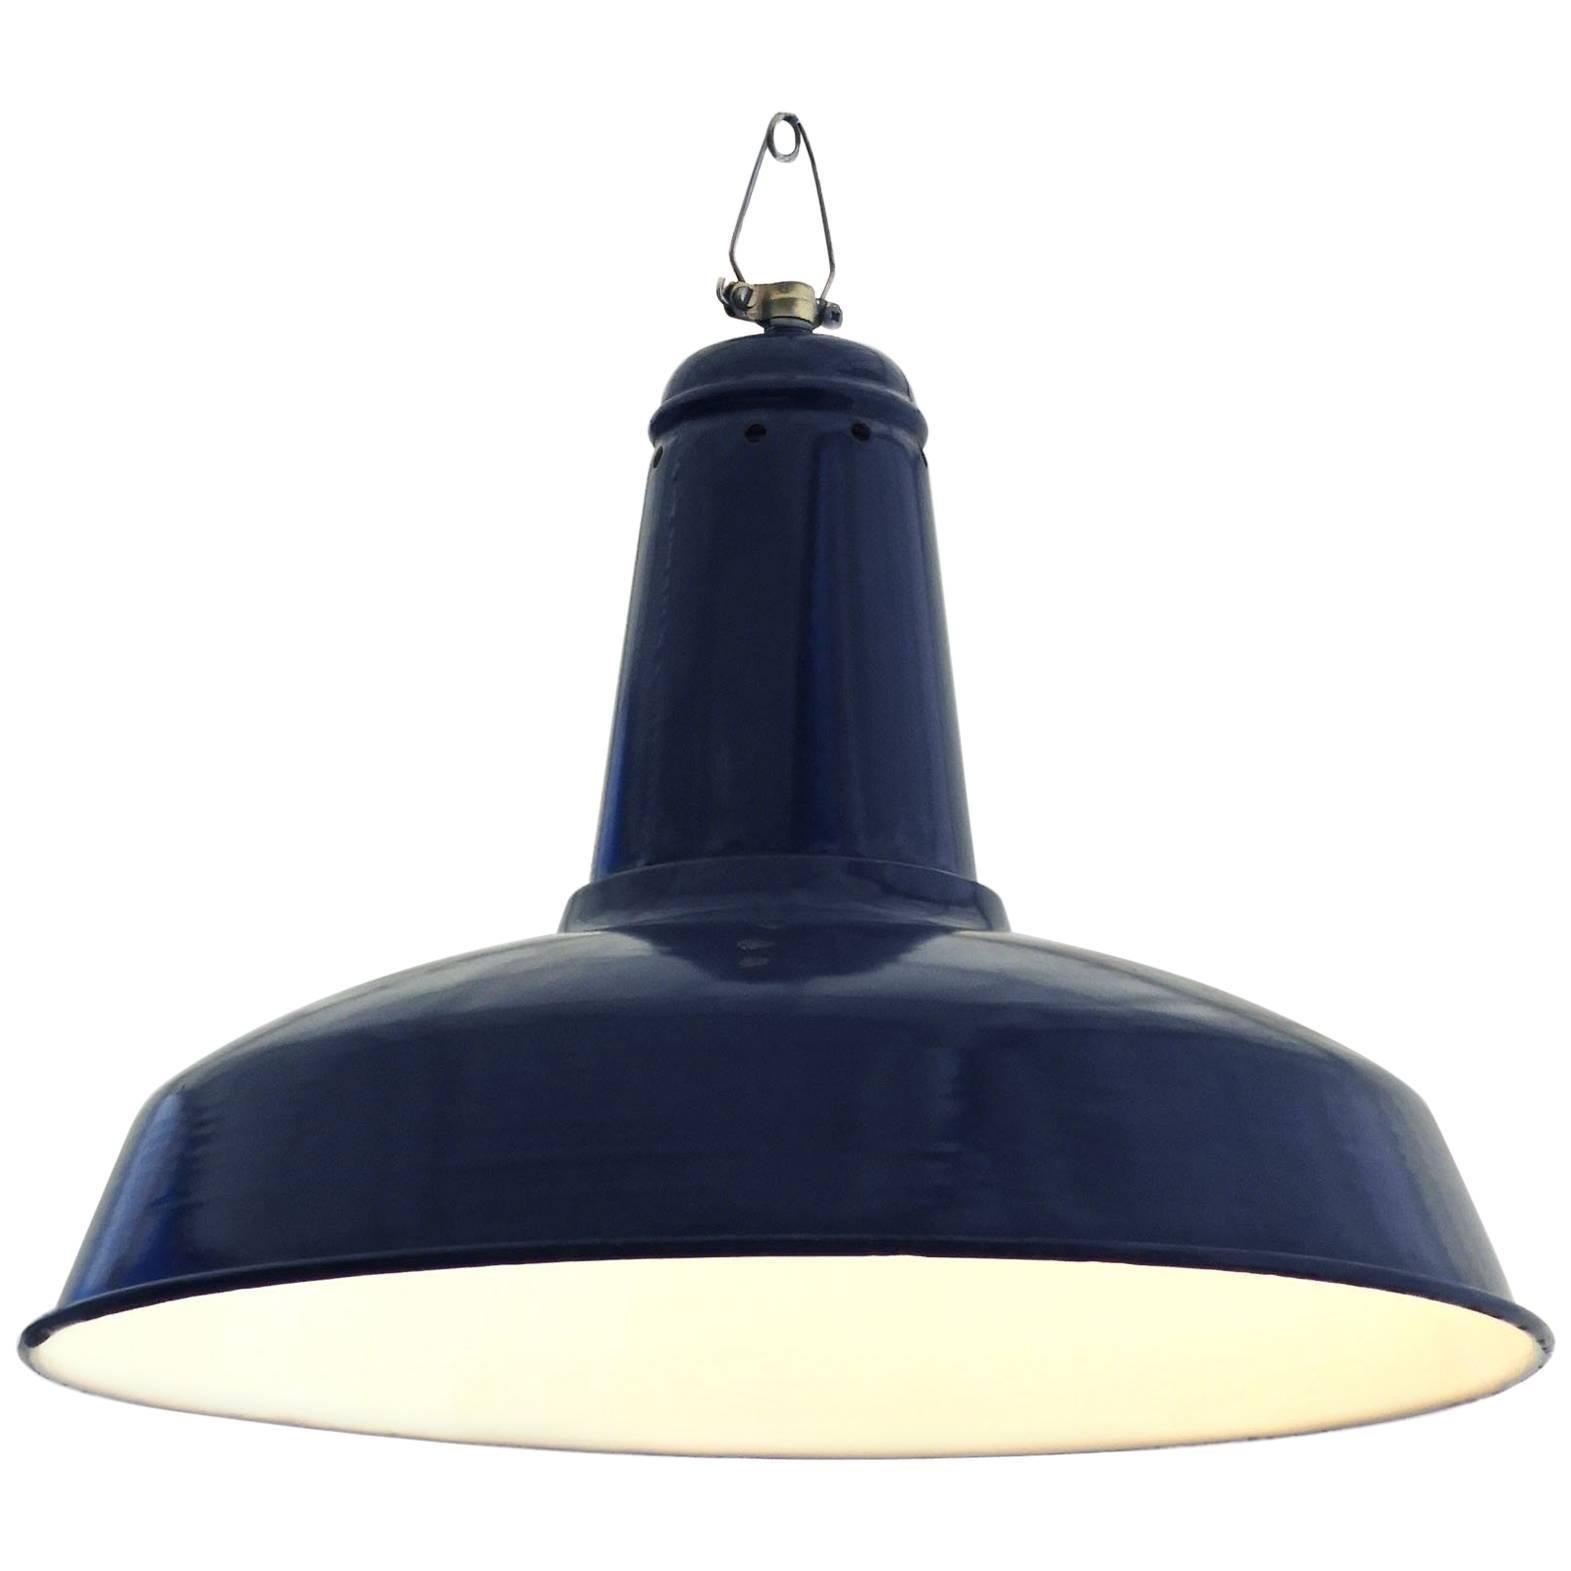 Midcentury Large Industrial Pendant Ceiling Light Loft Lighting Fixture